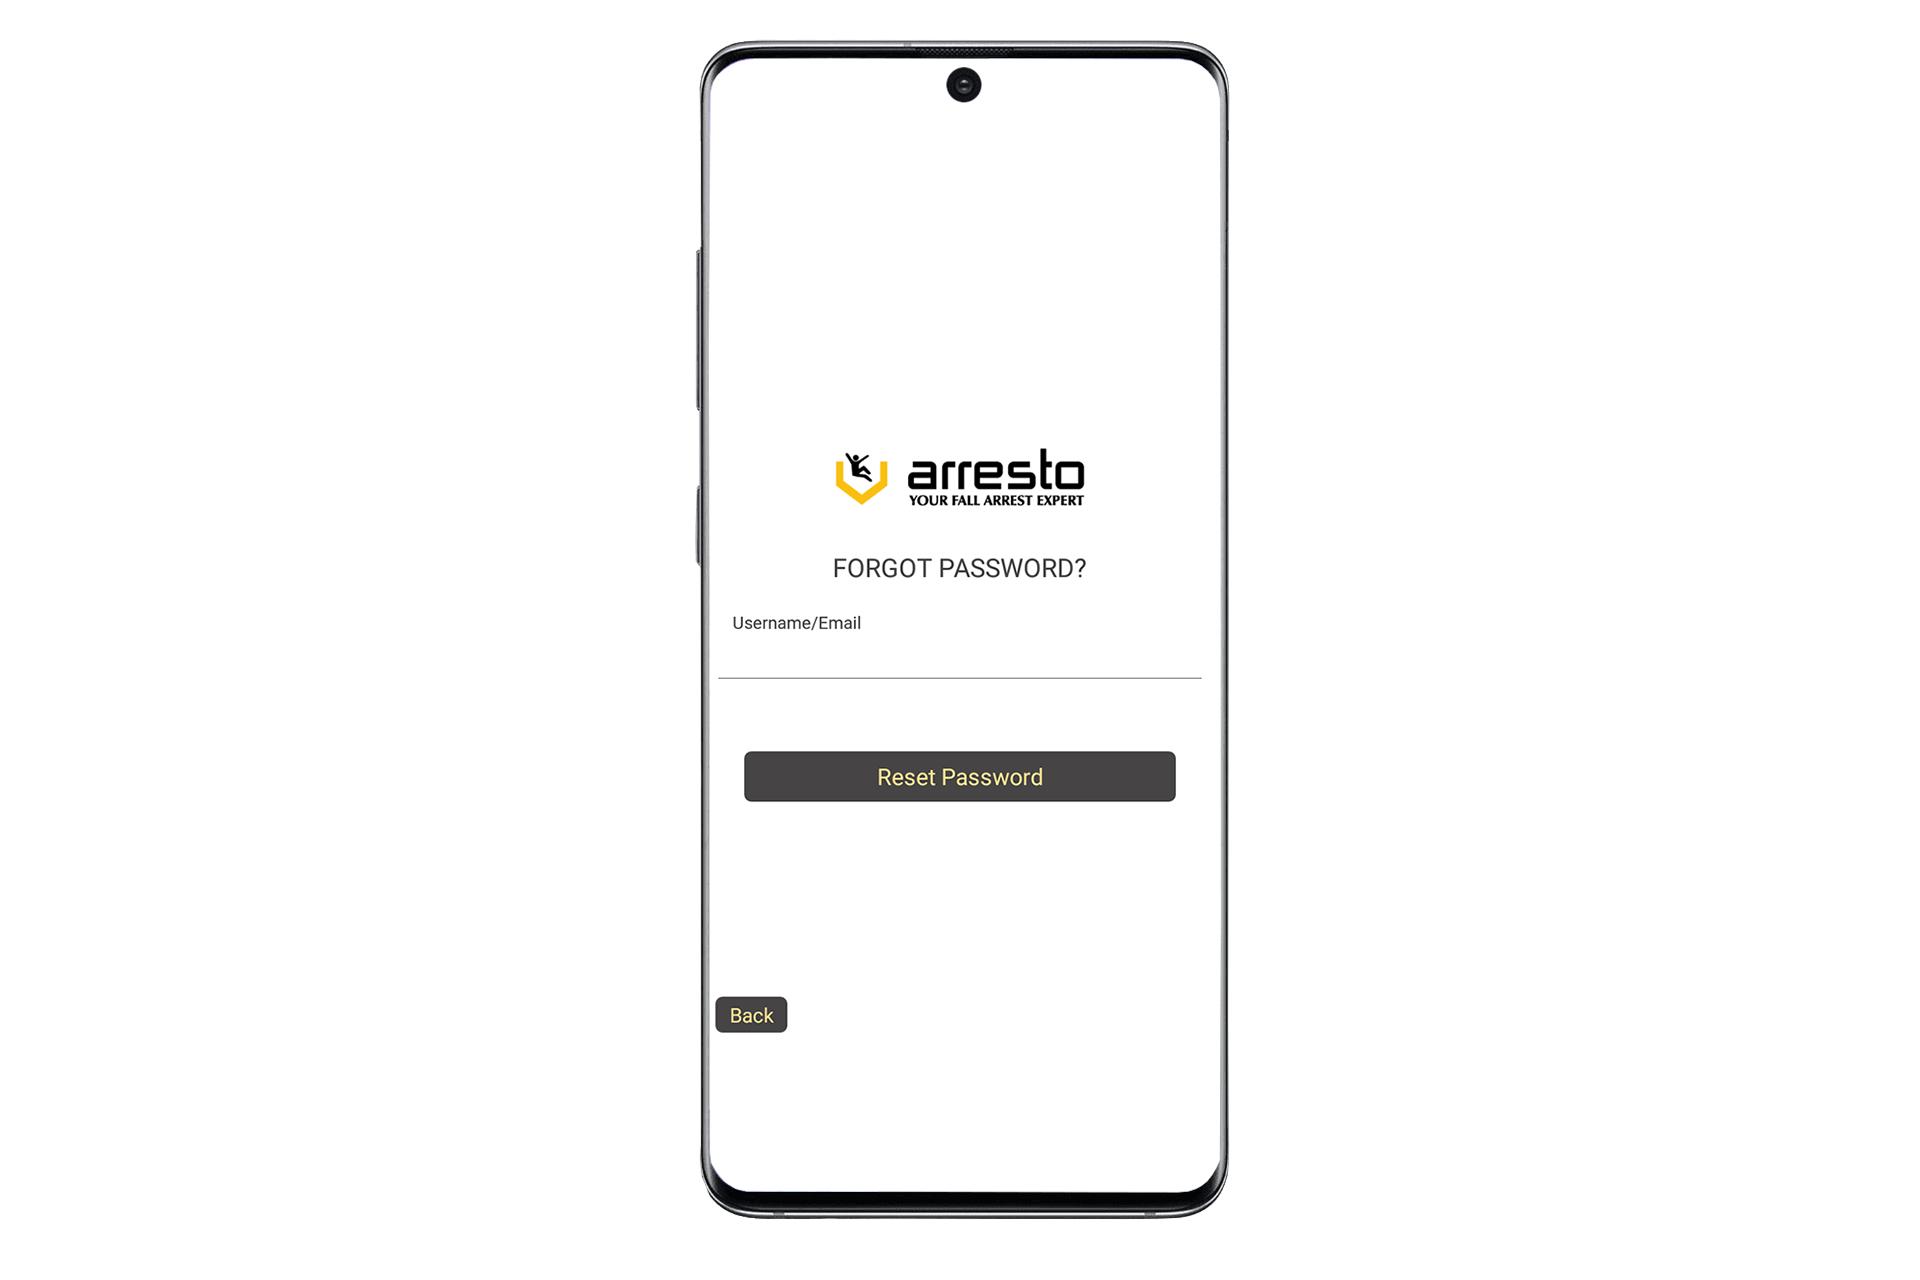 arresto-android-03